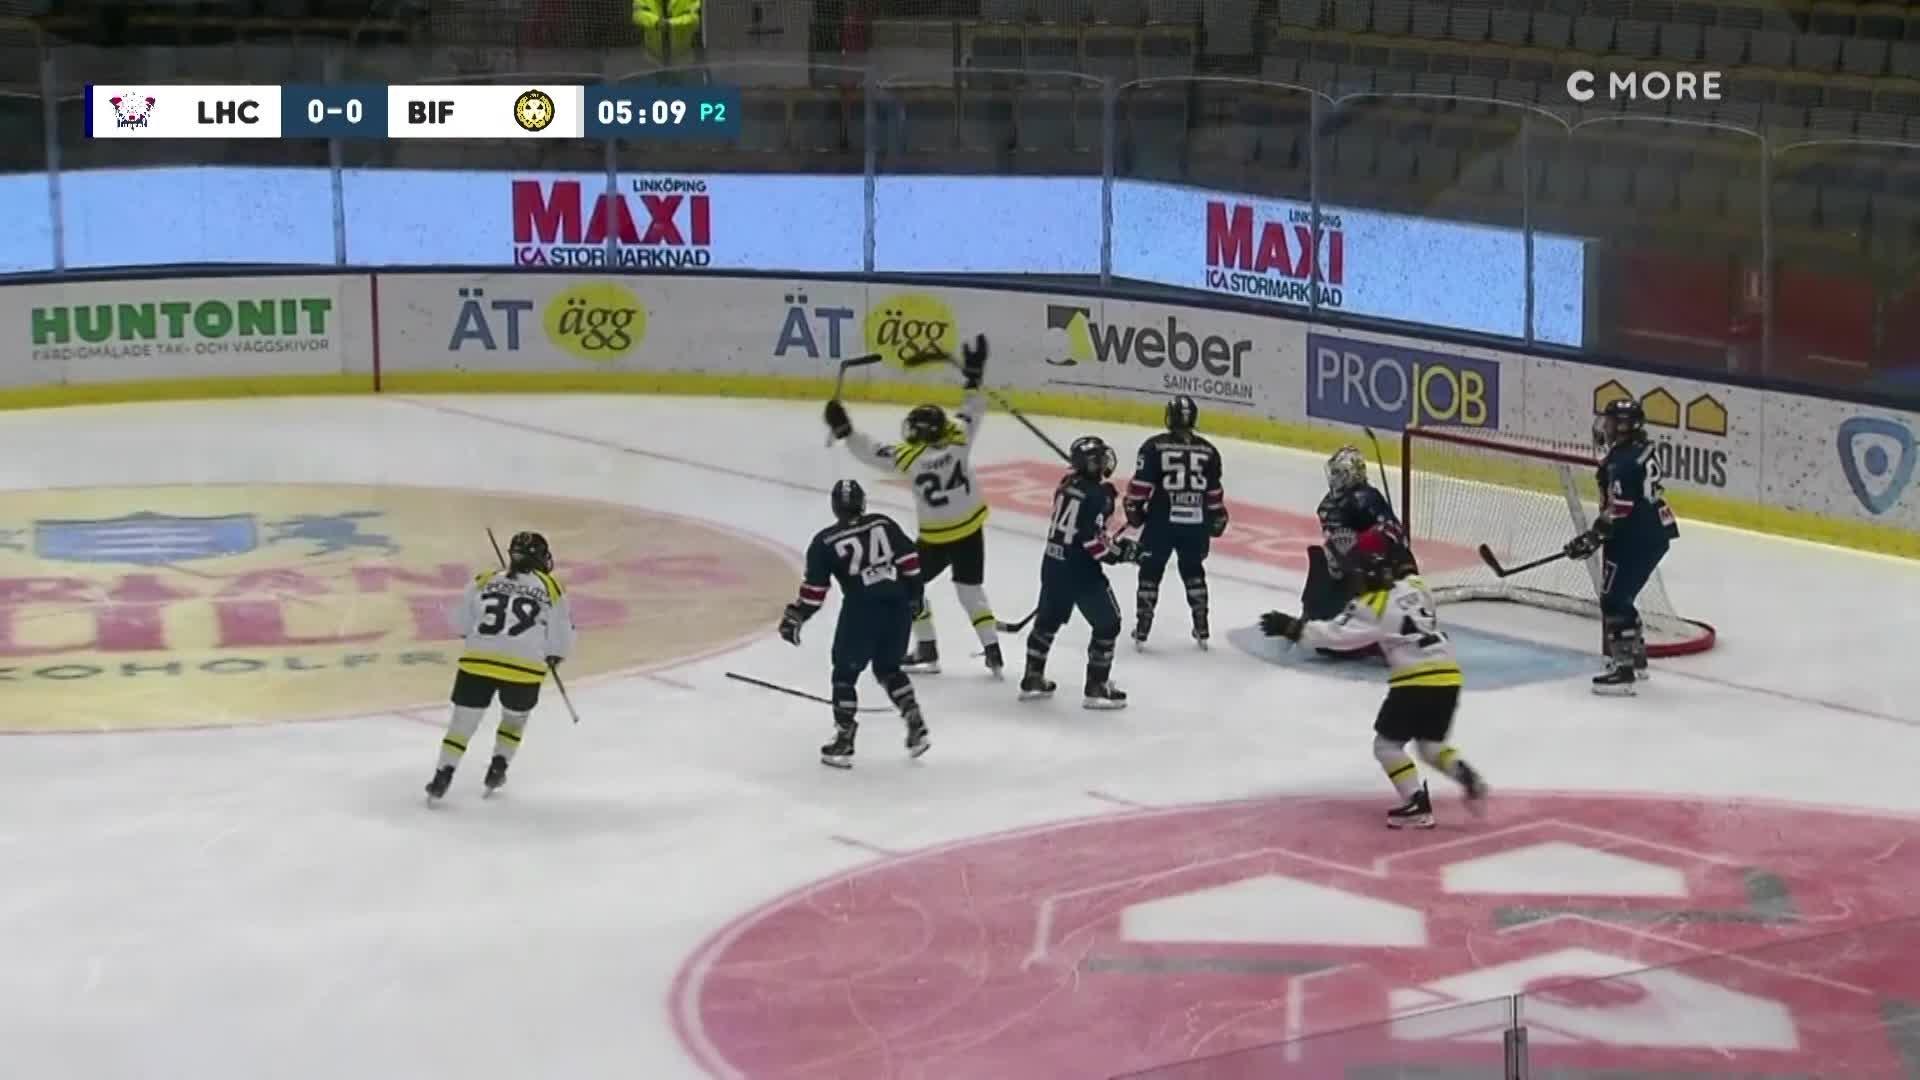 Höjdpunkter Erika Grahm Brynäs IF SDHL